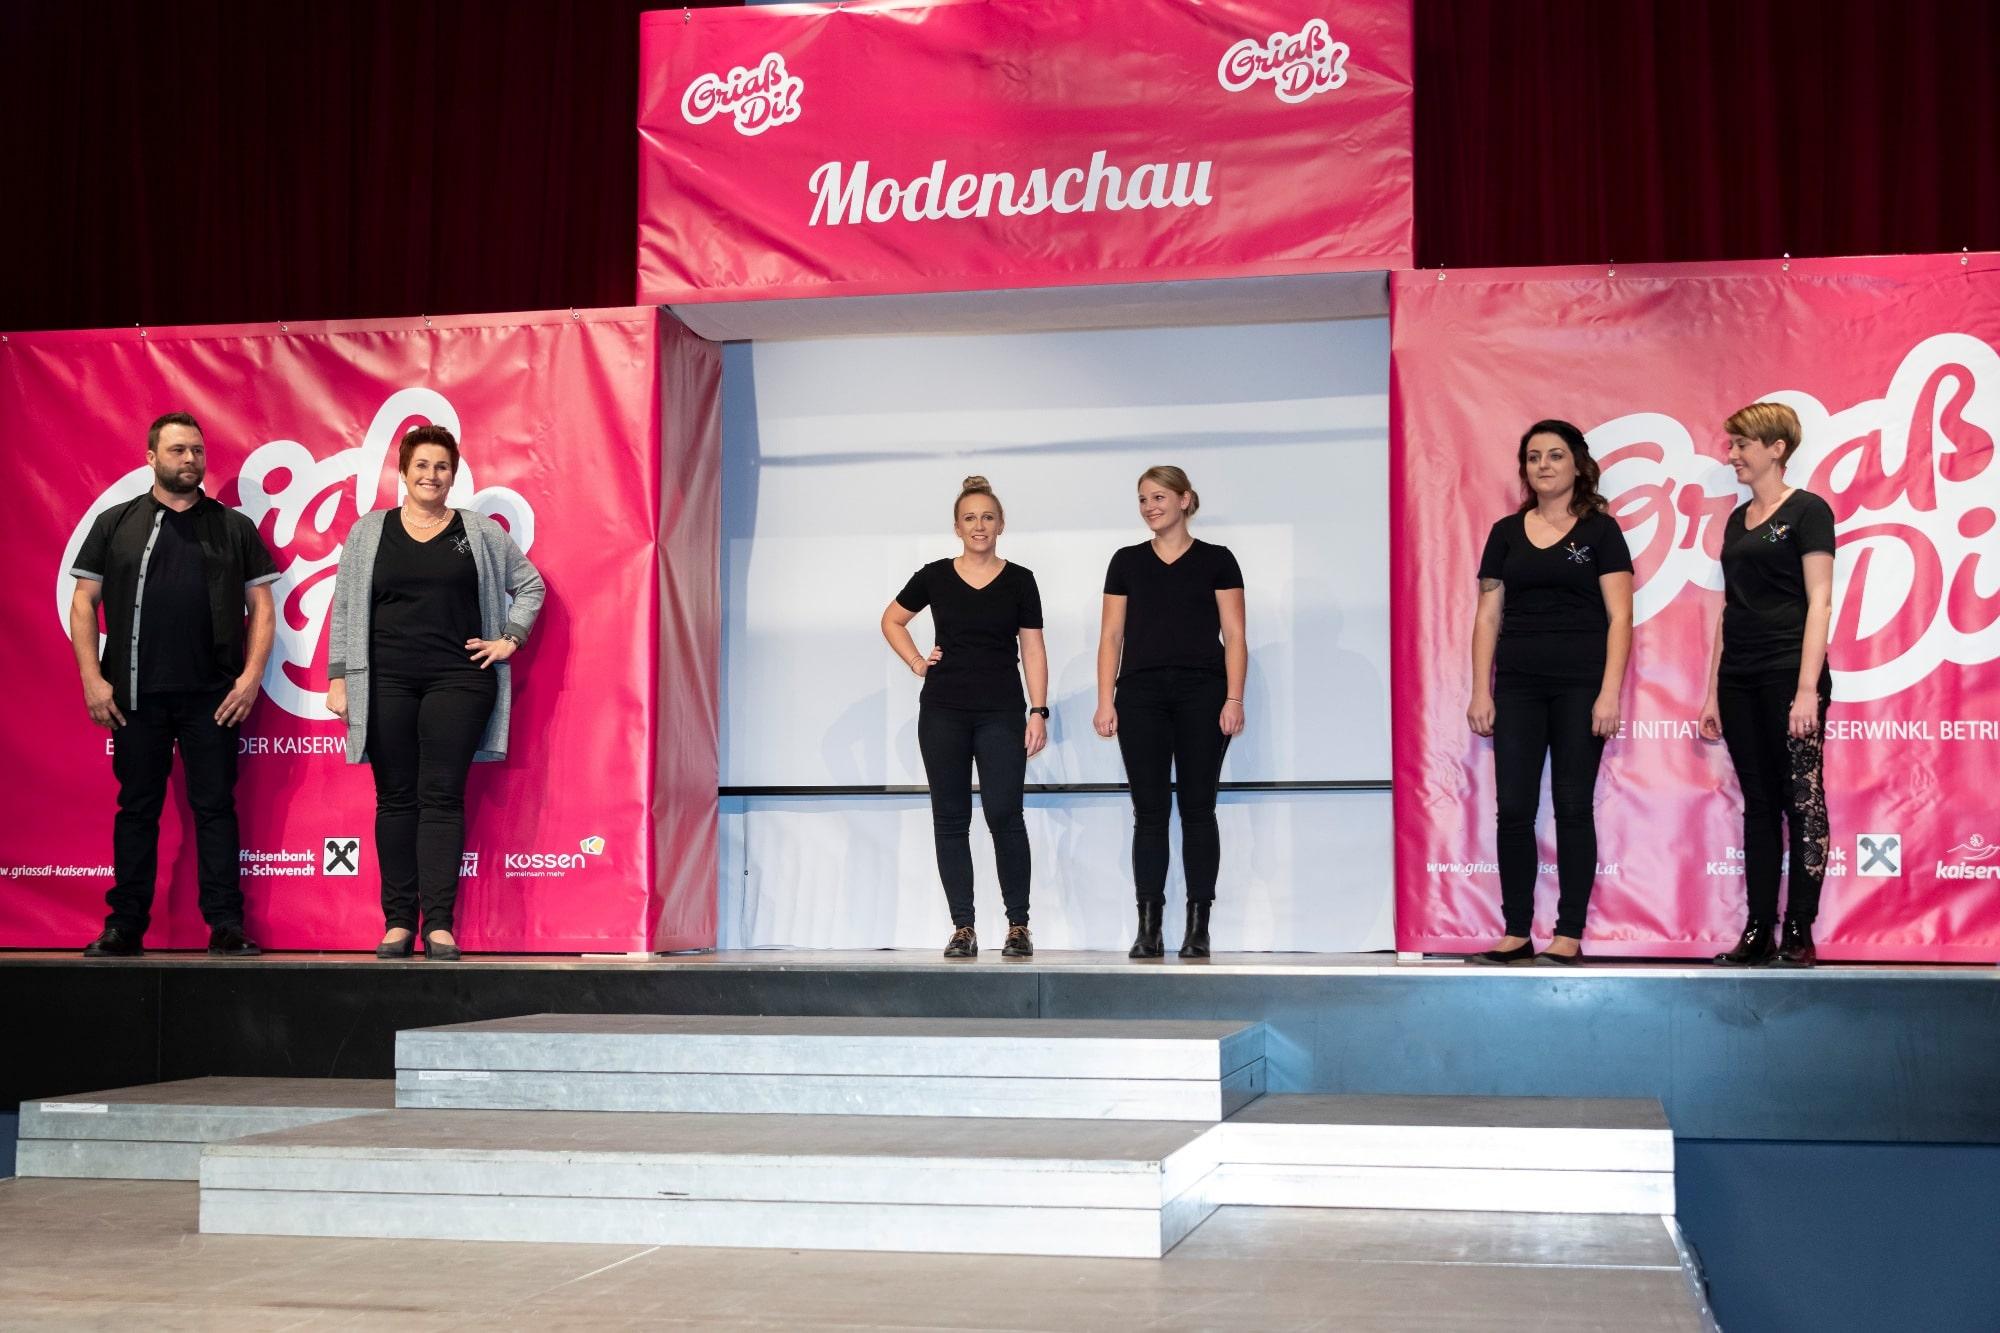 Modenschau2019 (4)-min